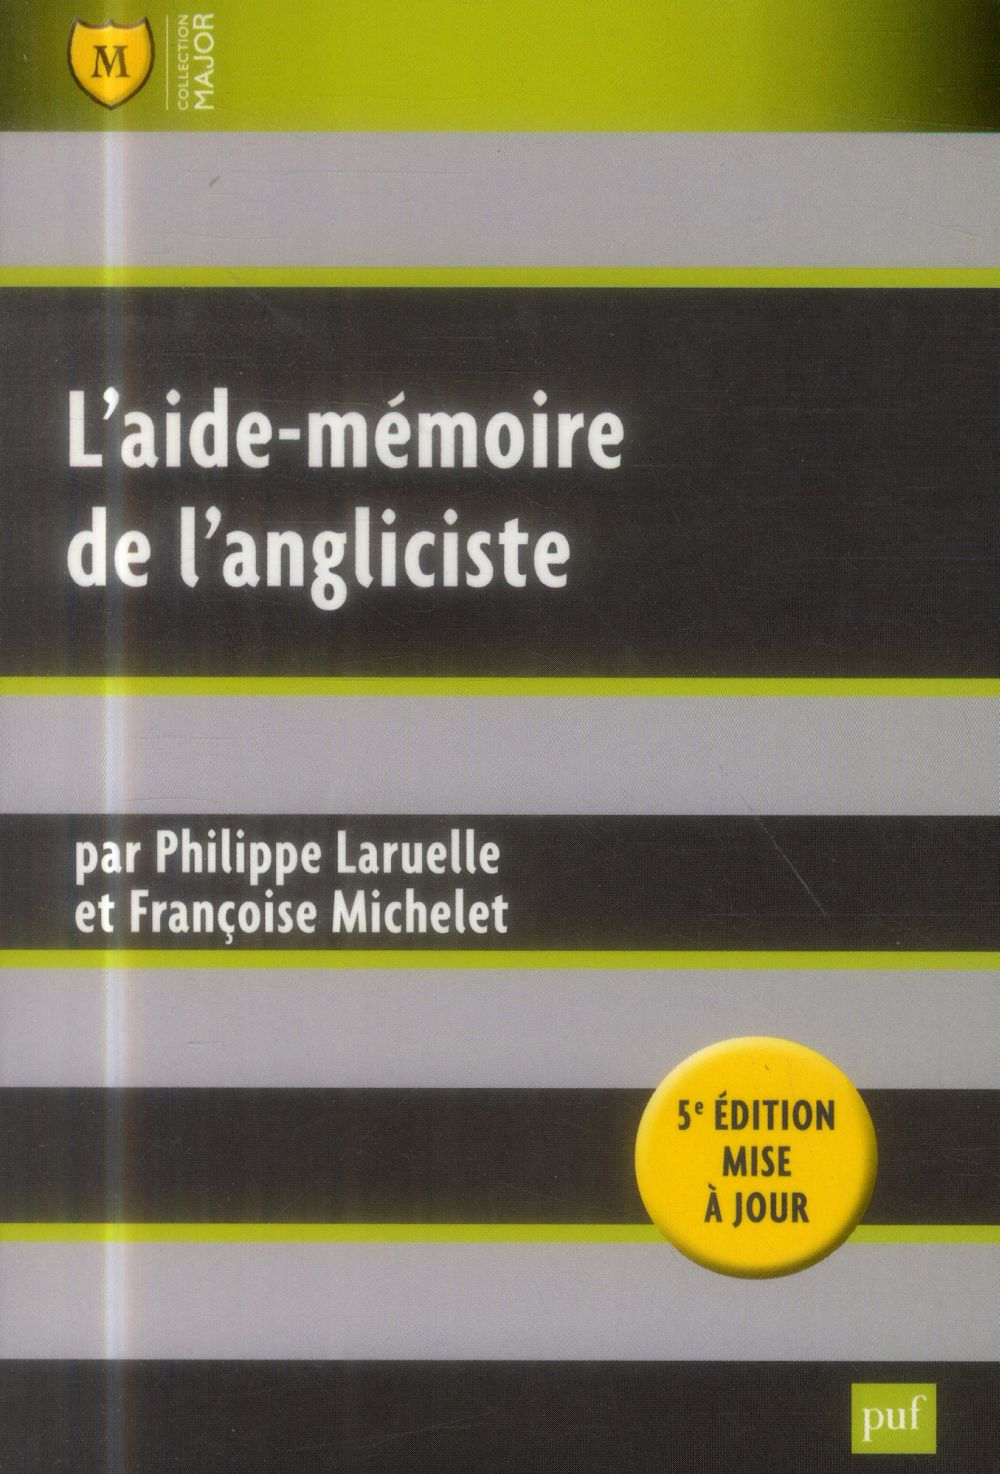 L'AIDE-MEMOIRE DE L'ANGLICISTE